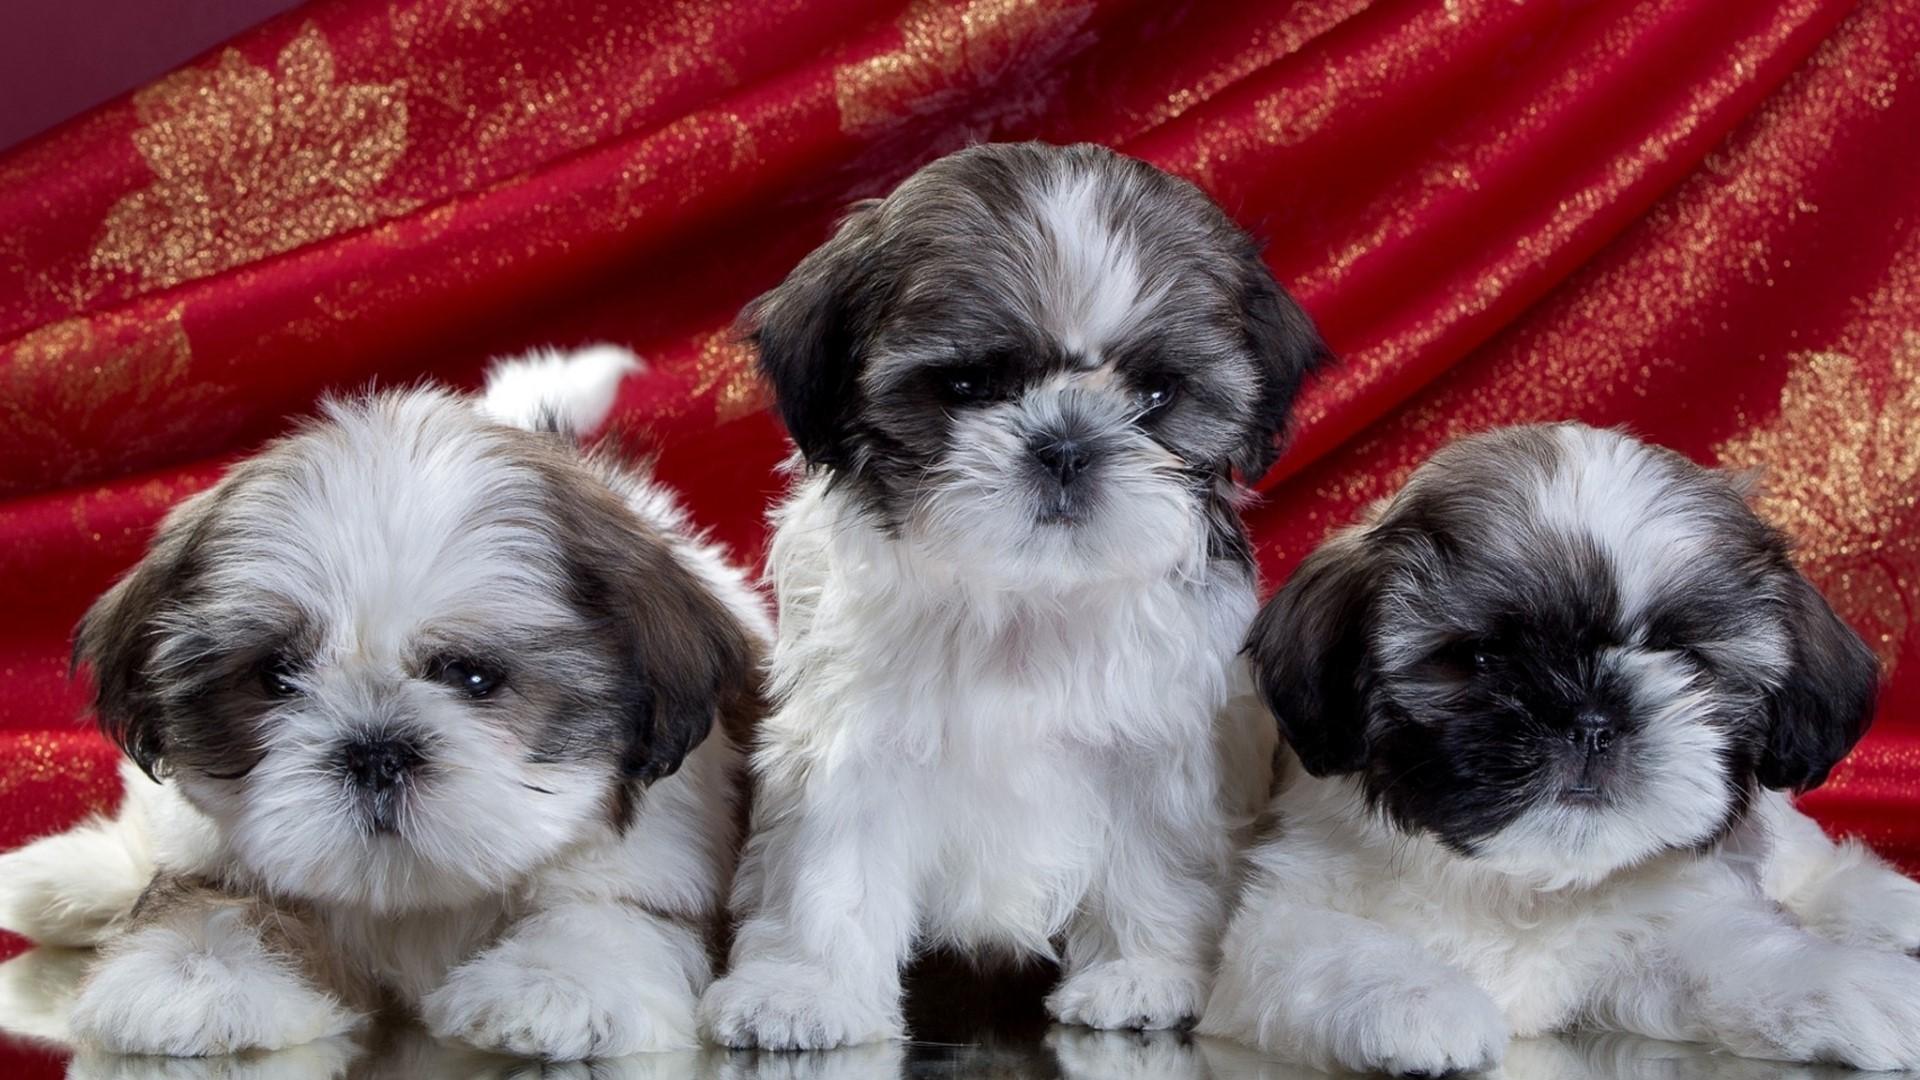 Shih Tzu Puppies Hd Wallpaper Background Image 1920x1080 Id